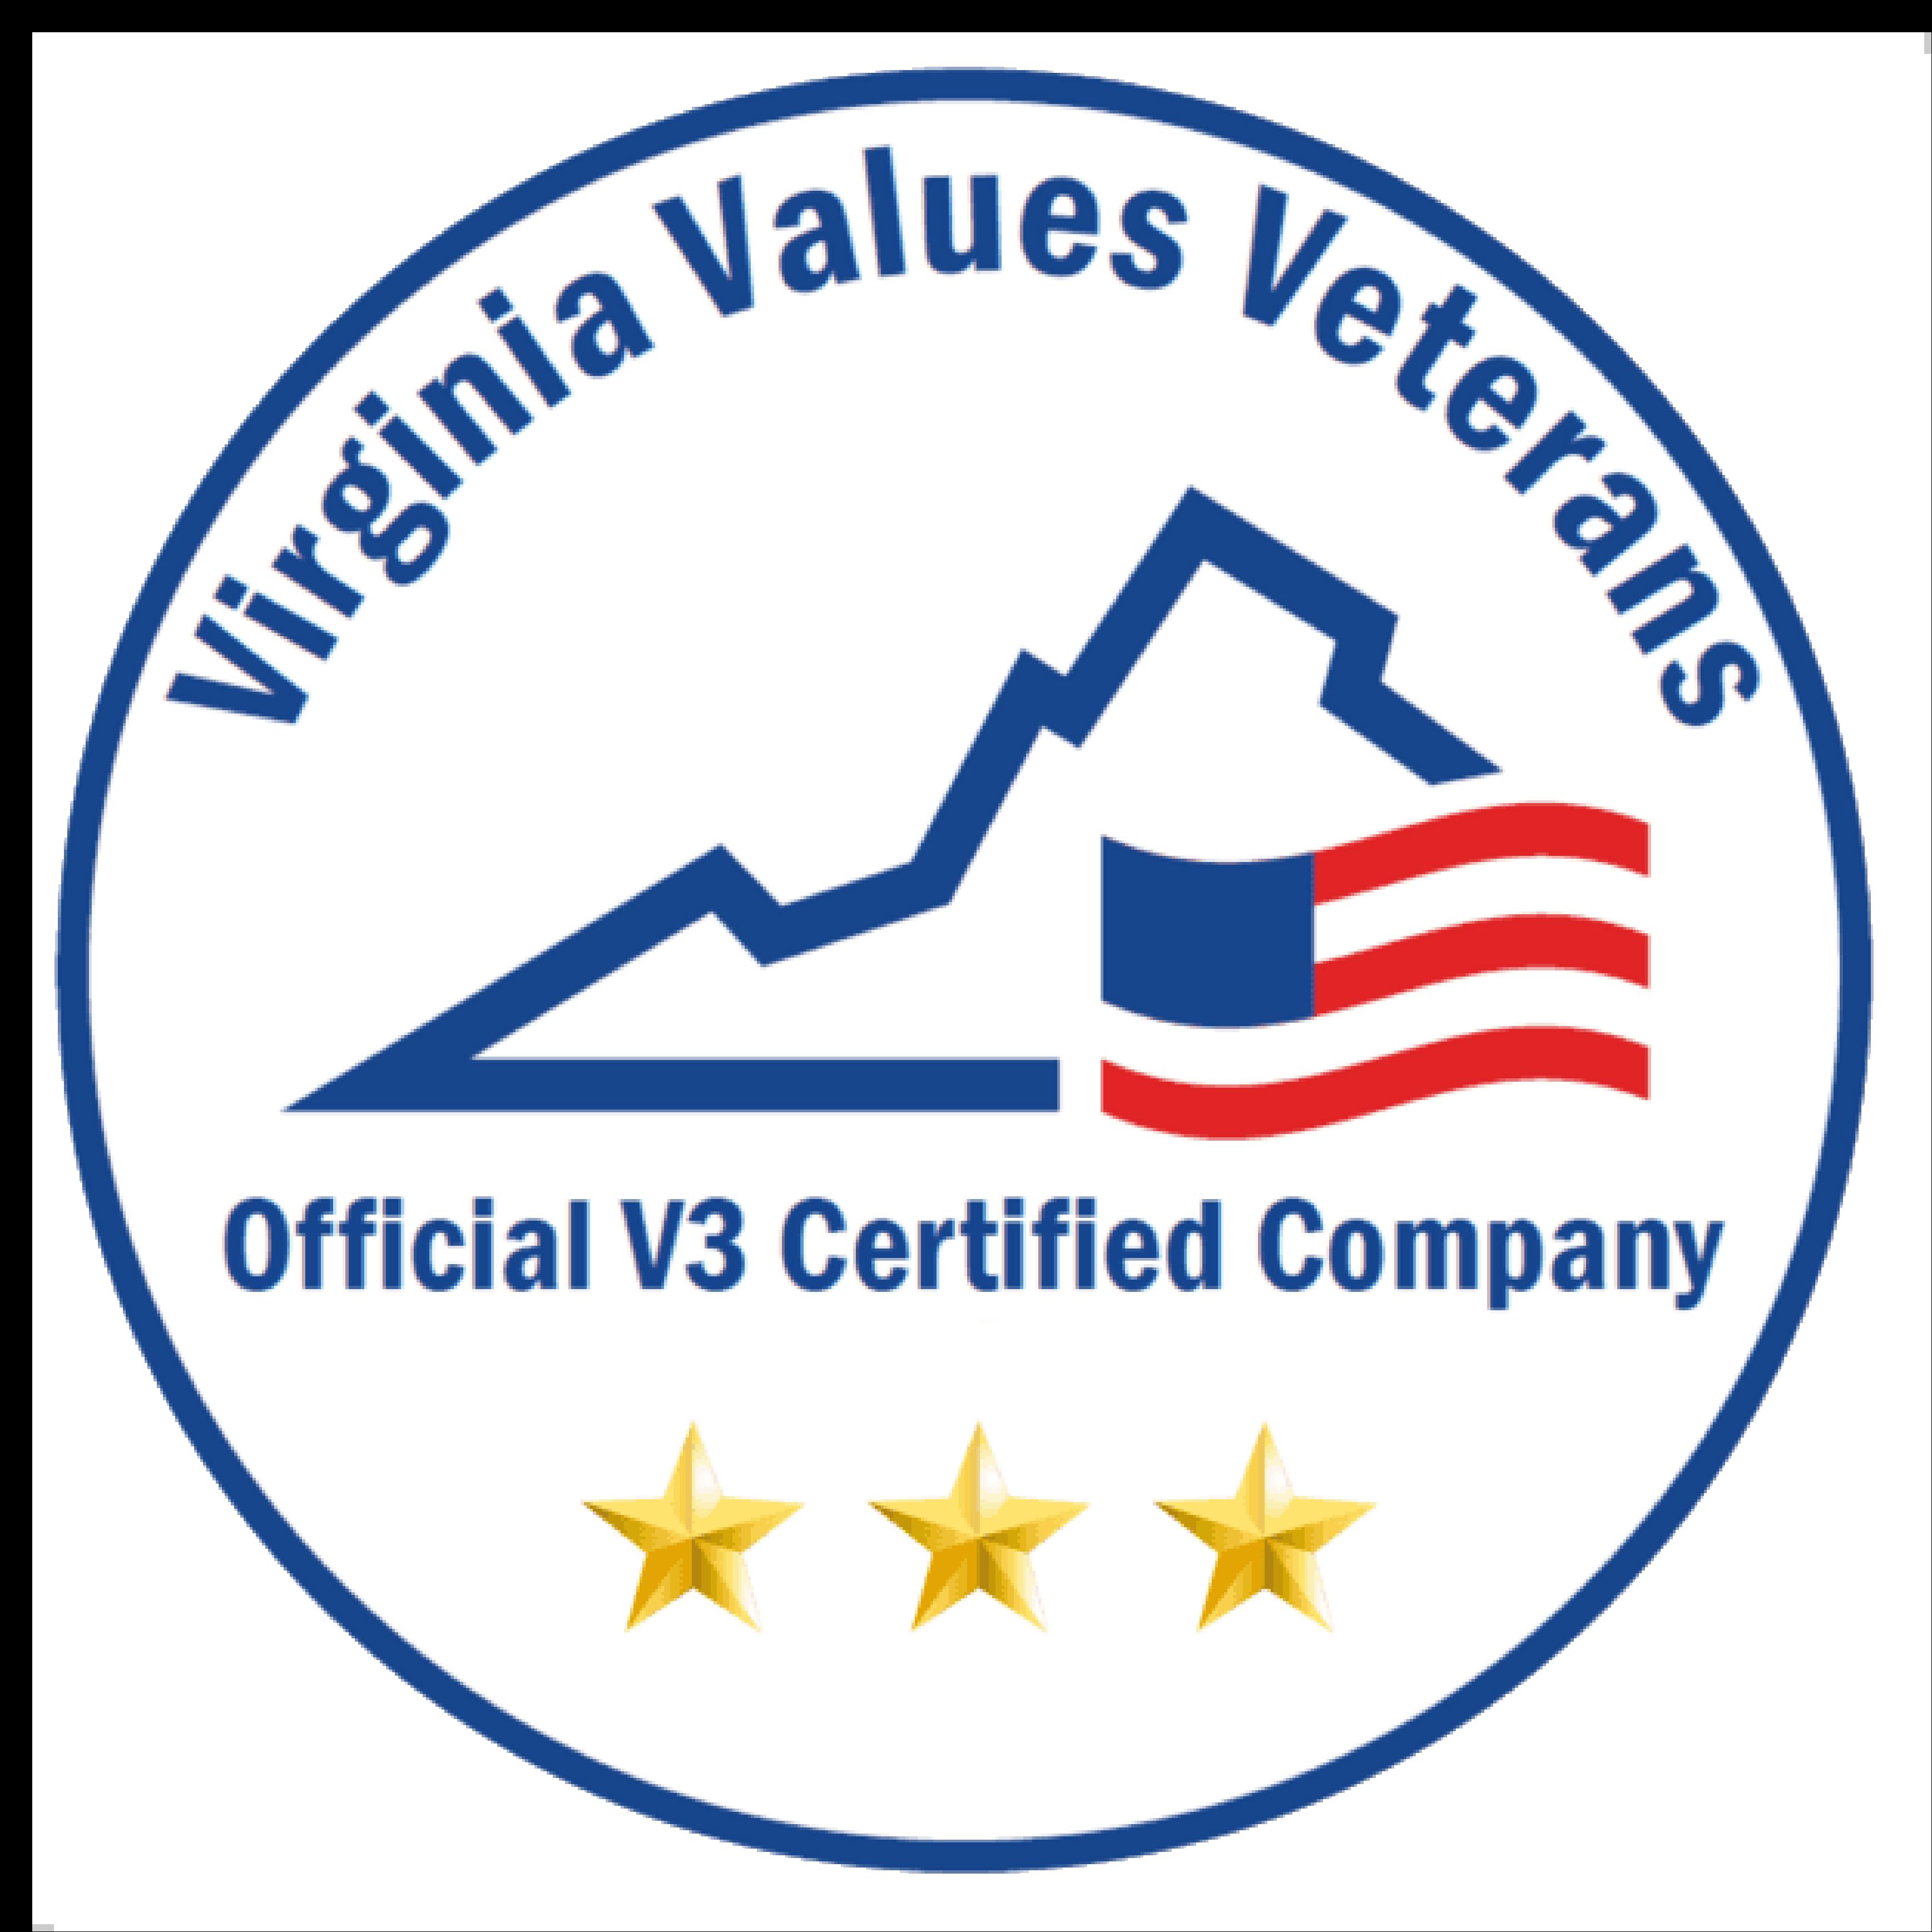 Virginia Values Veterans Certified